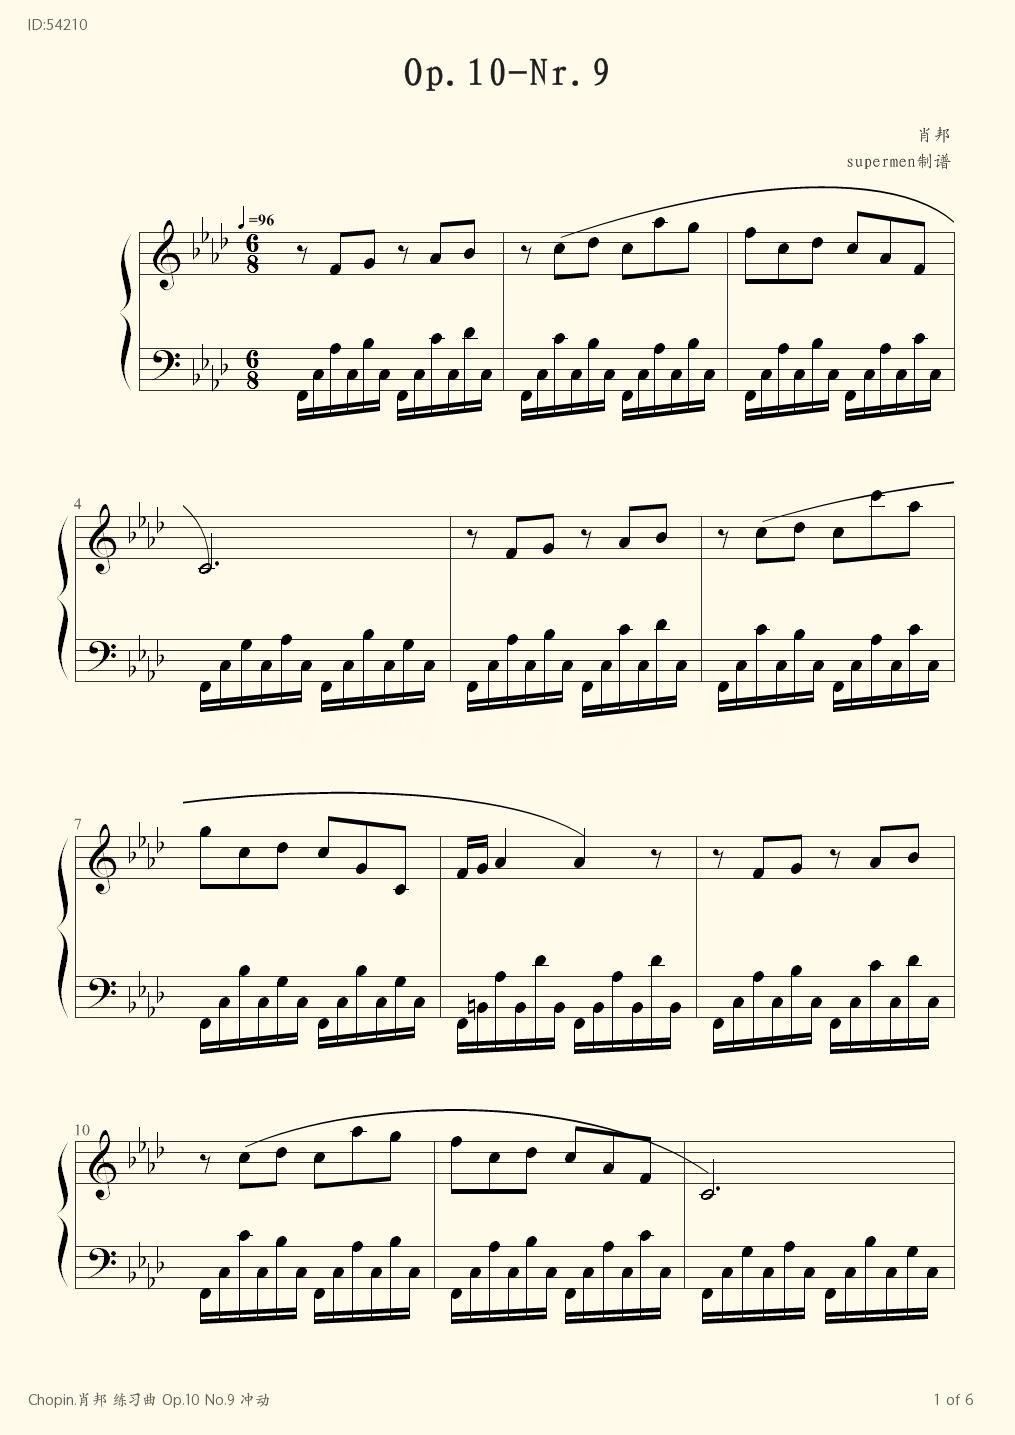 Chopin Op 10 No 9  - Chopin  - first page